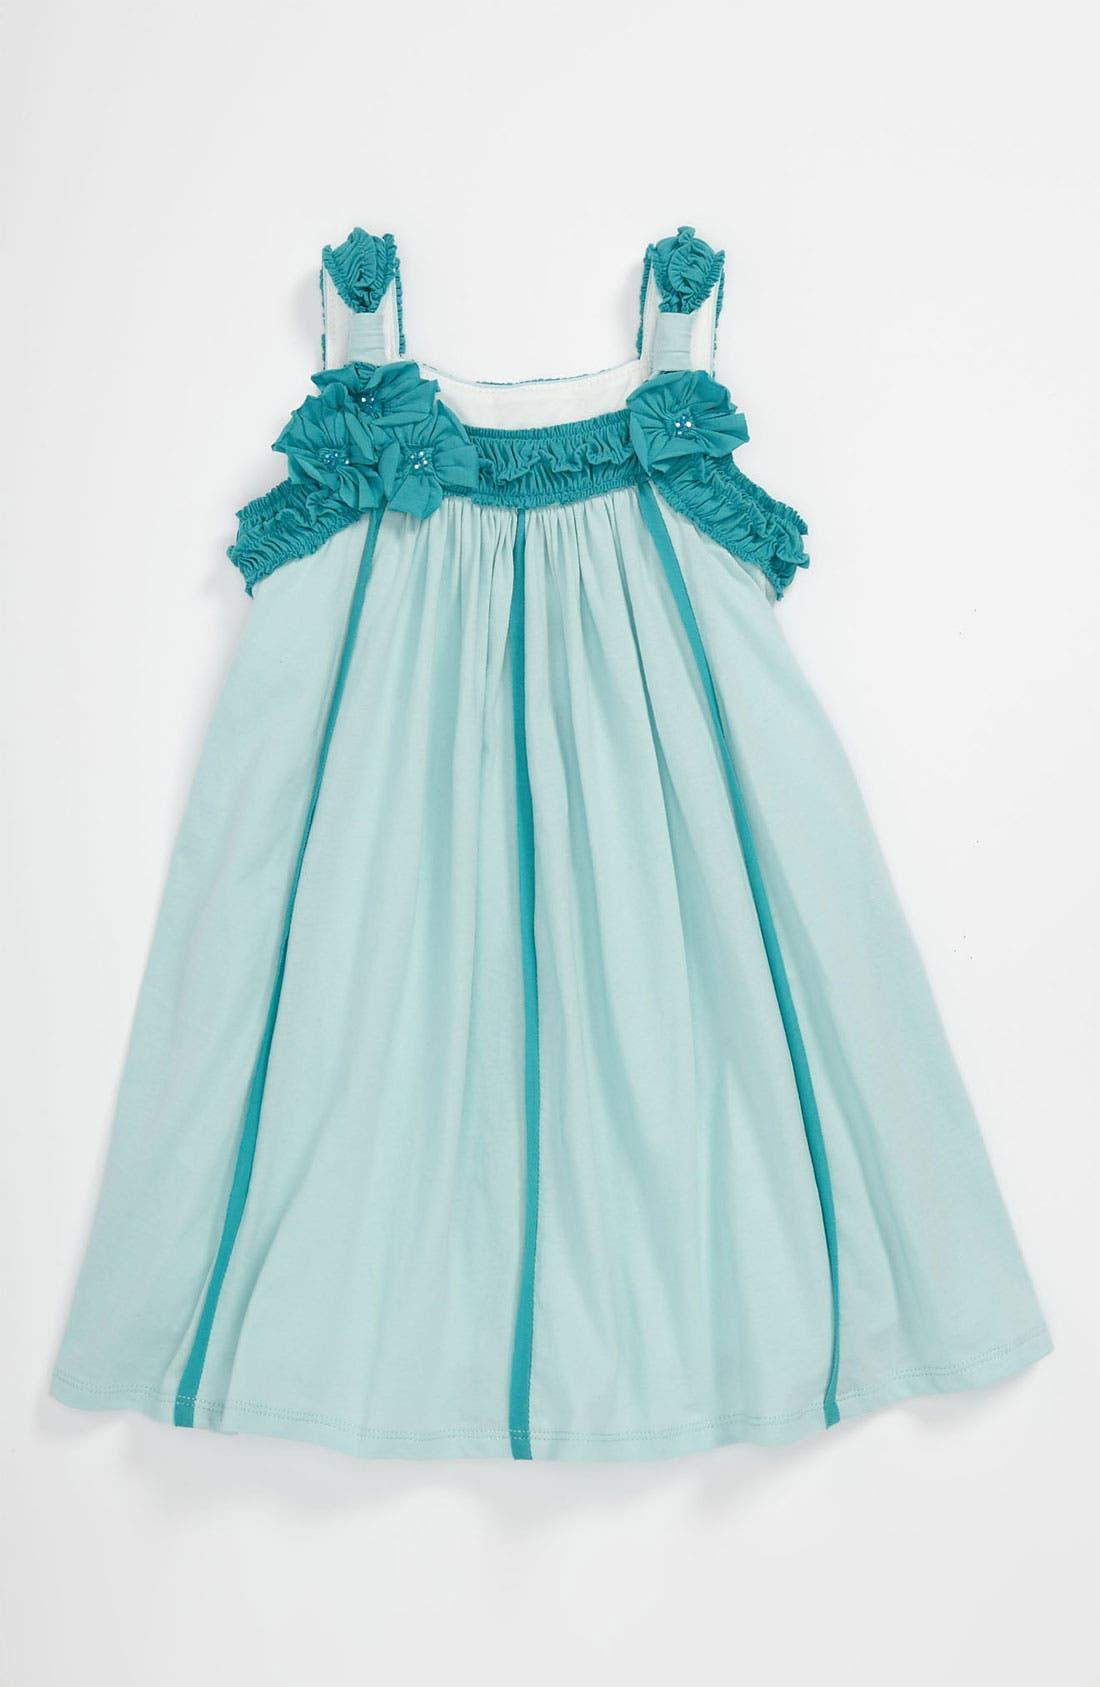 Main Image - Isobella & Chloe 'Sophia' Dress (Toddler)